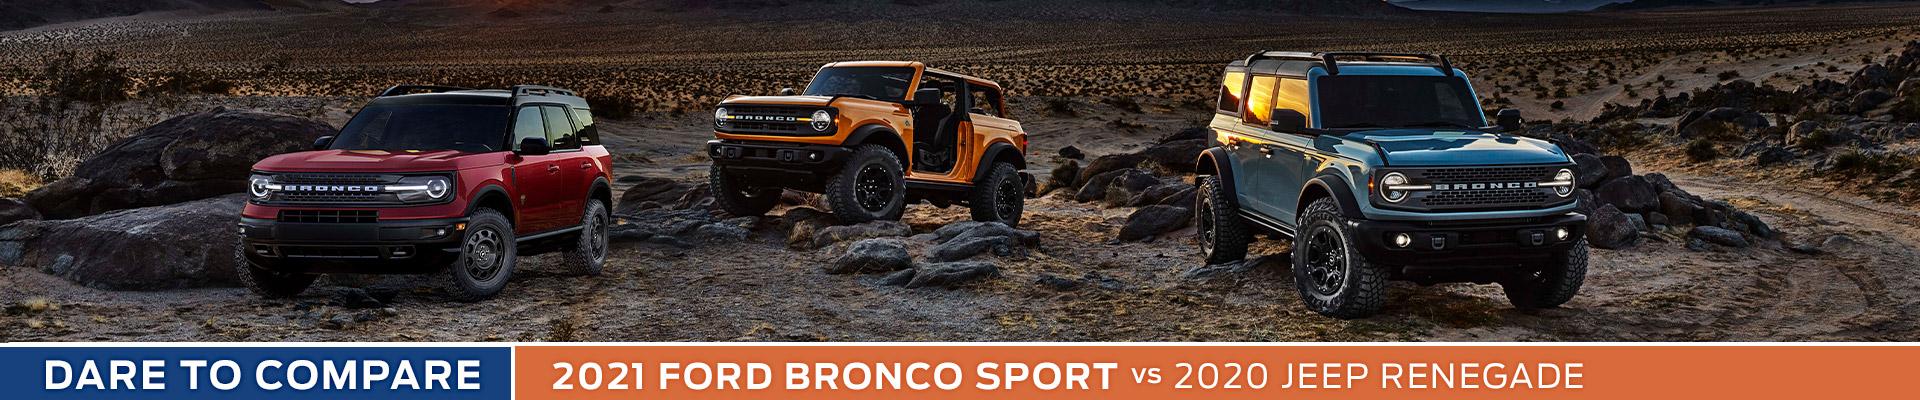 2021 Ford Bronco Sport vs. Jeep Renegade - Sun State Ford - Orlando, FL